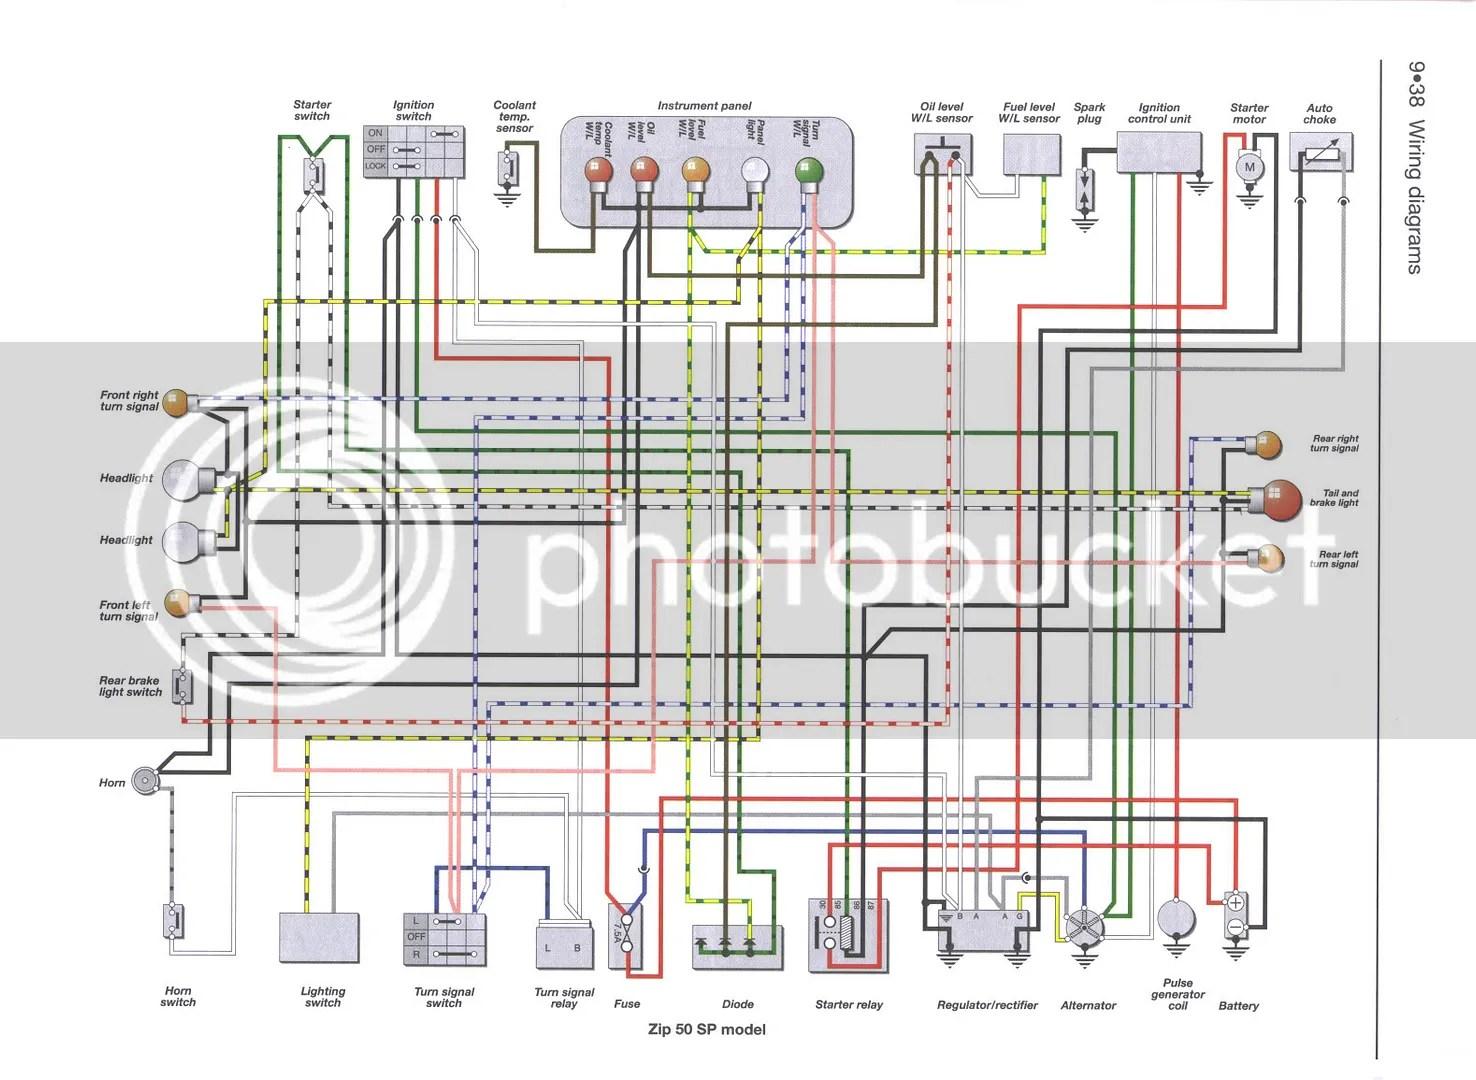 hight resolution of  array piaggio wiring diagrams wiring library rh 1 poldermama nl